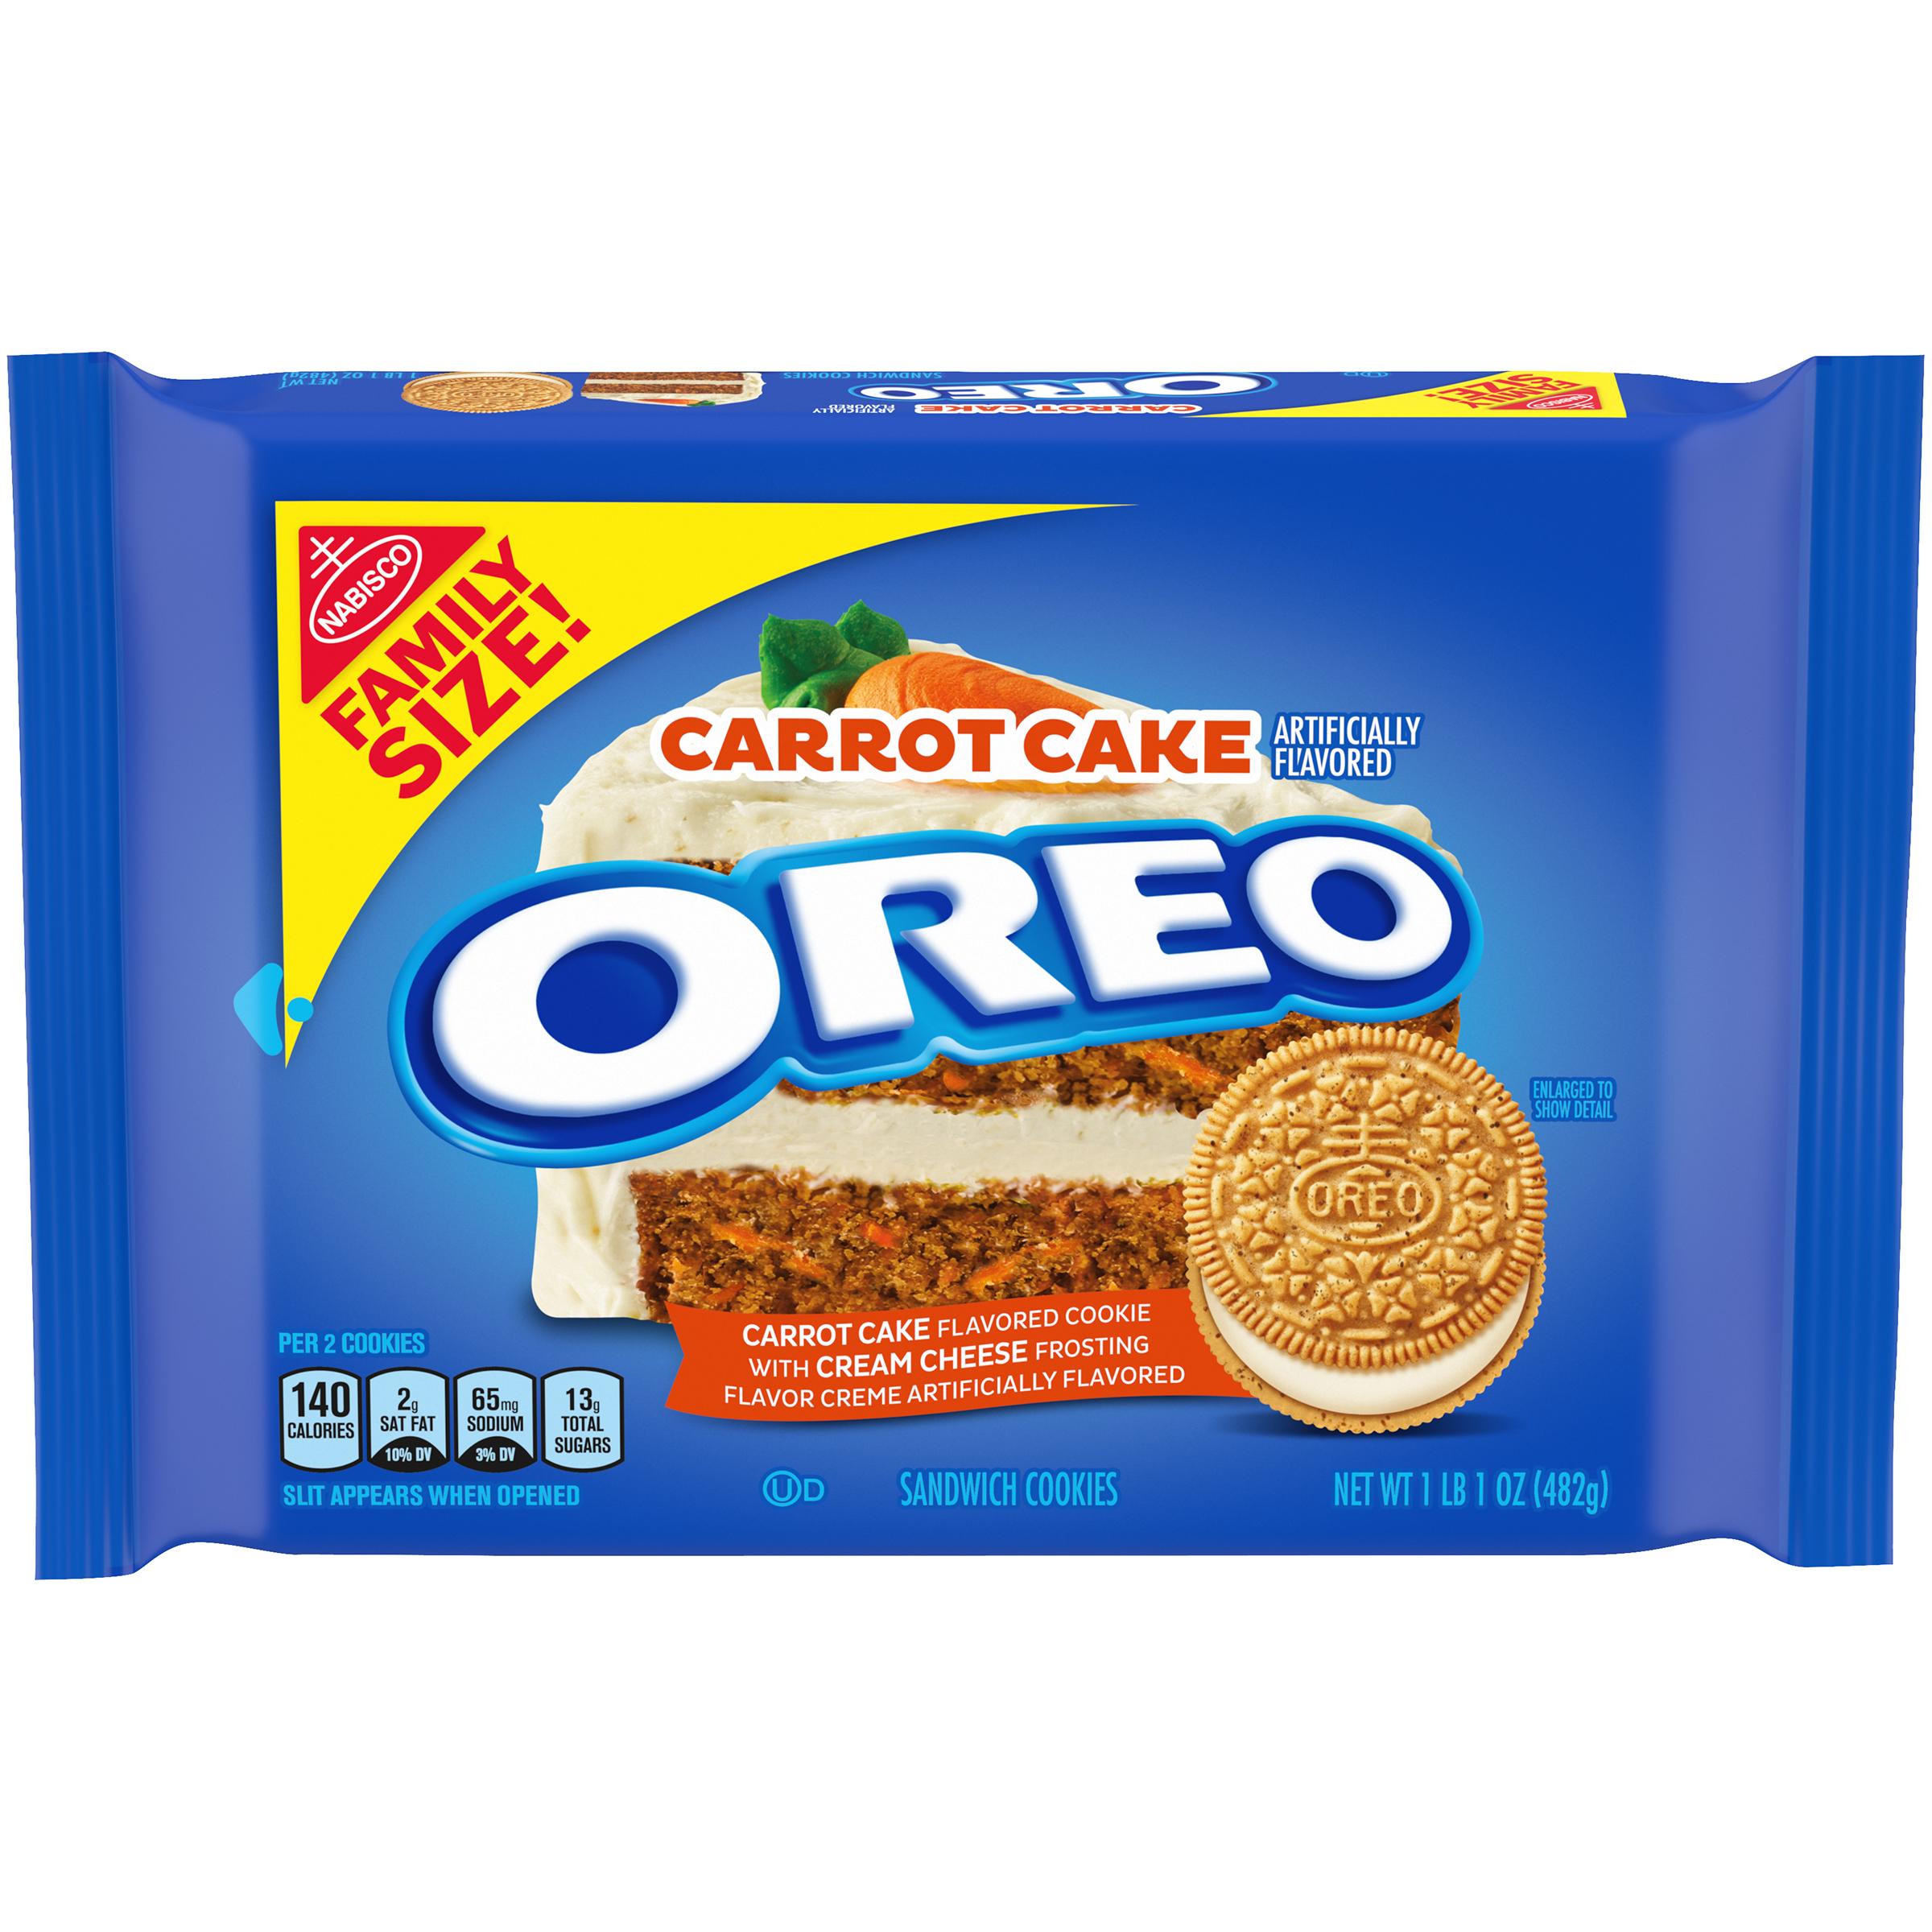 OREO Carrot Cake Sandwich Cookies 17 oz